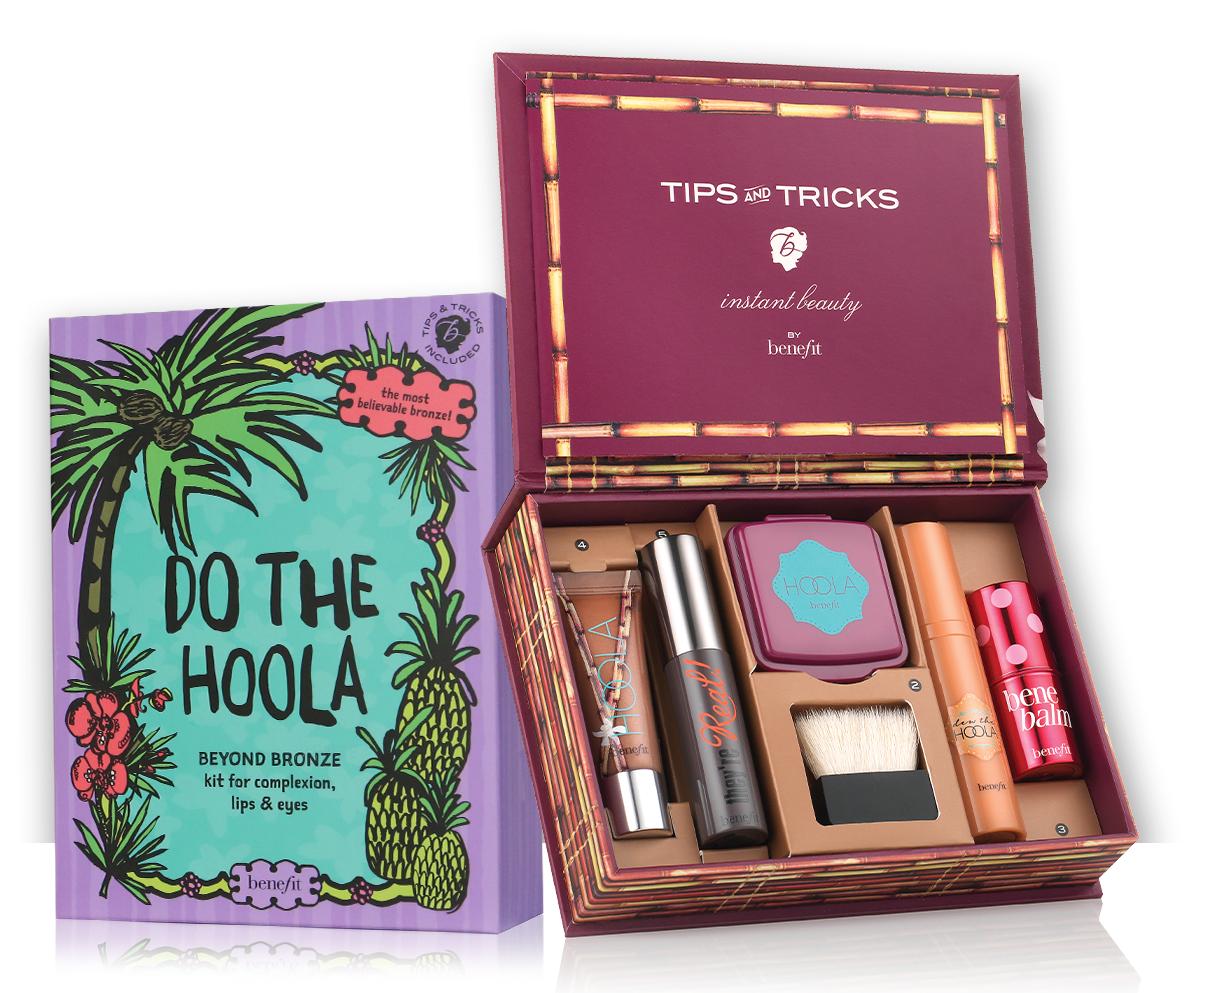 Benefit Cosmetics Do The Hoola Beyond Bronze Kit